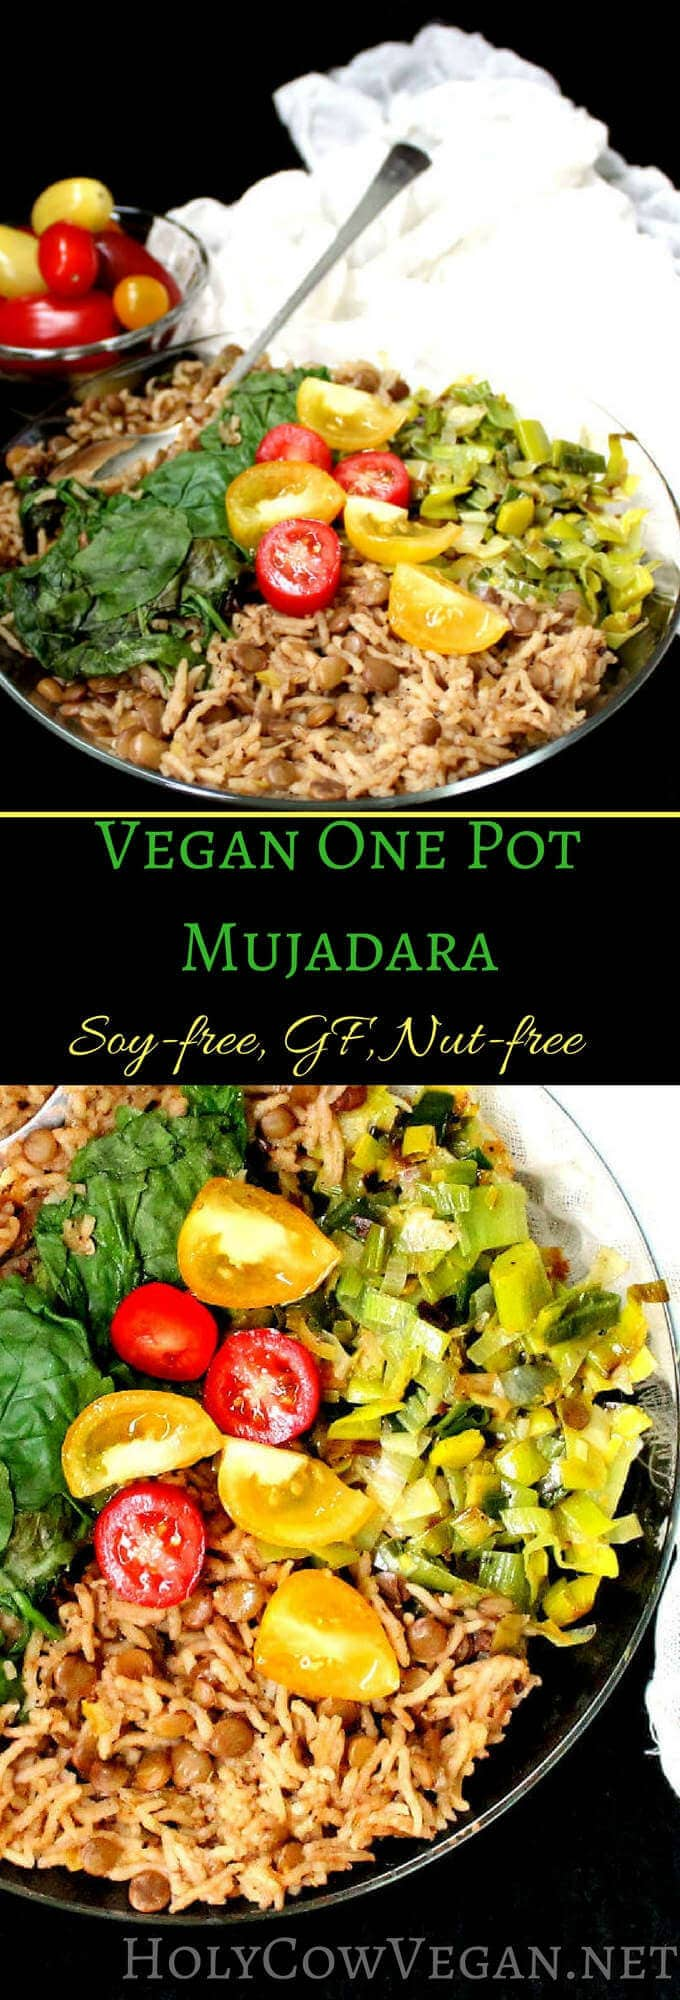 Vegan One-Pot Mujadara, gluten-free, soy-free, nut-free - holycowvegan.net